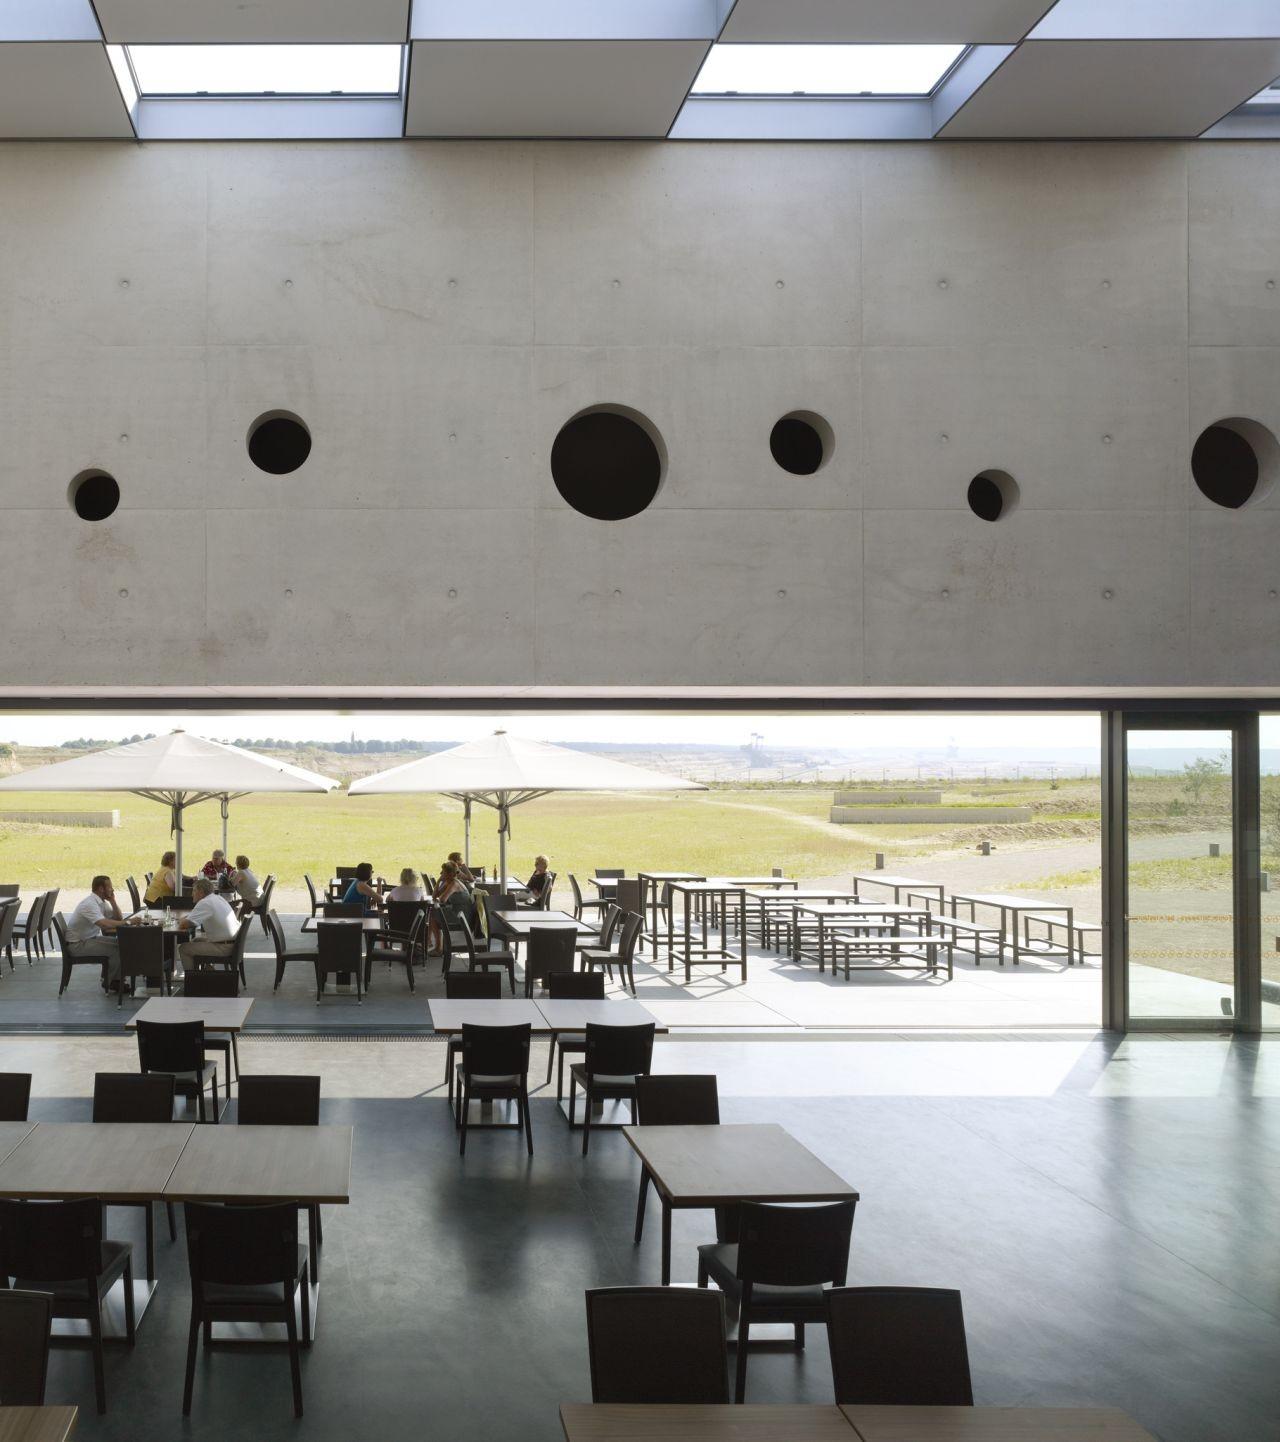 Forum_Terra Nova / Lüderwaldt Architects